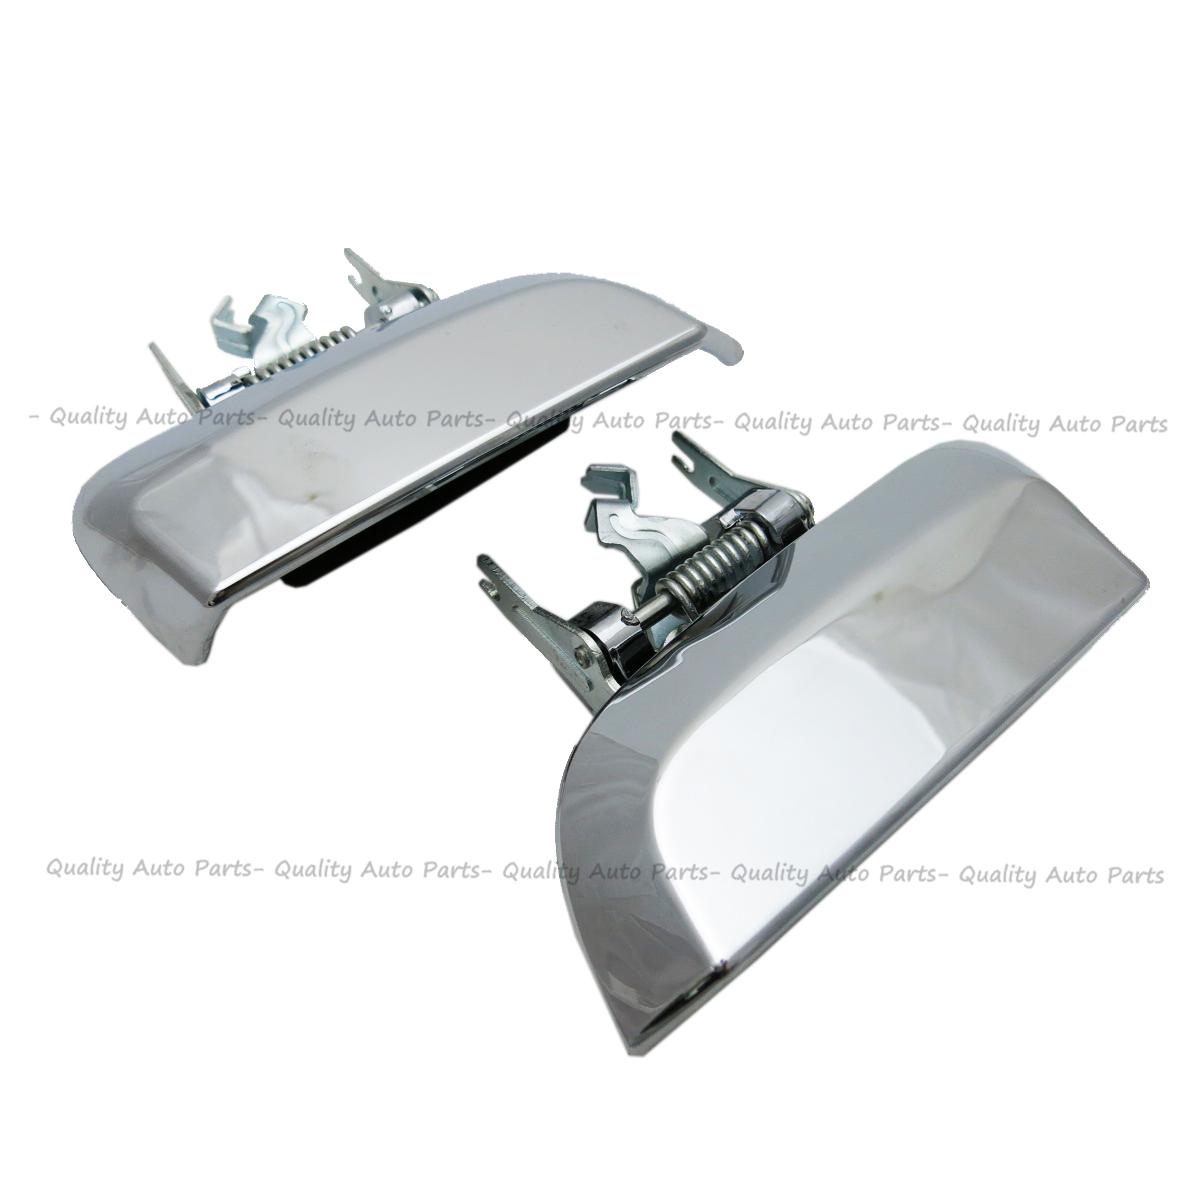 Door Handle Pair Inner Black Chrome Lever For Nissan Pathfinder R51 2005-2013